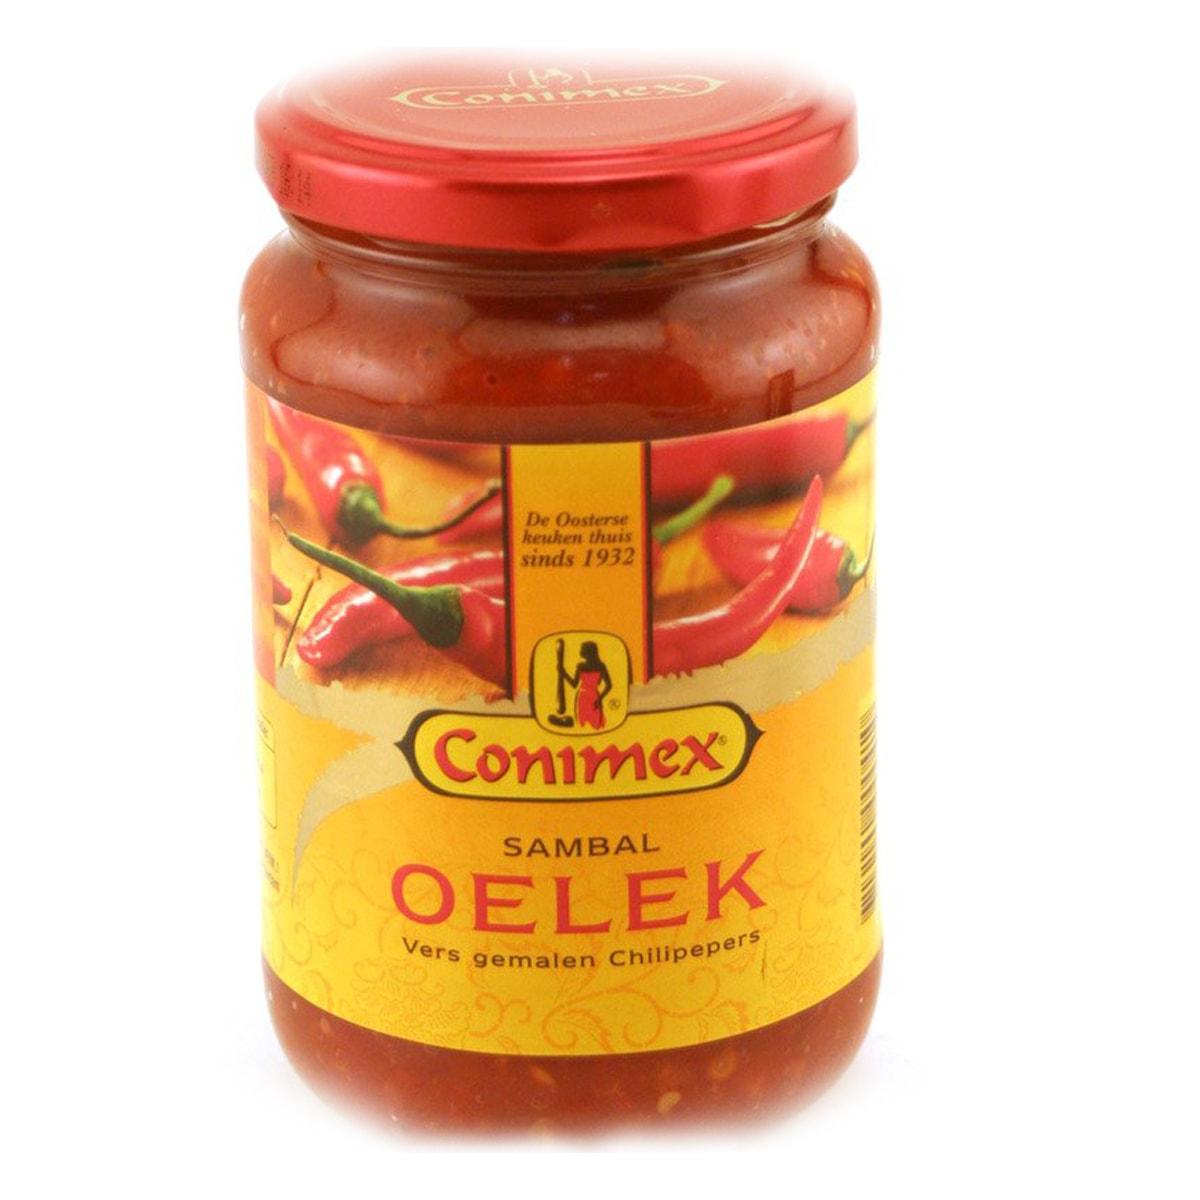 Buy Conimex Sambal Oelek (Hot Chilli Paste) - 190 gm